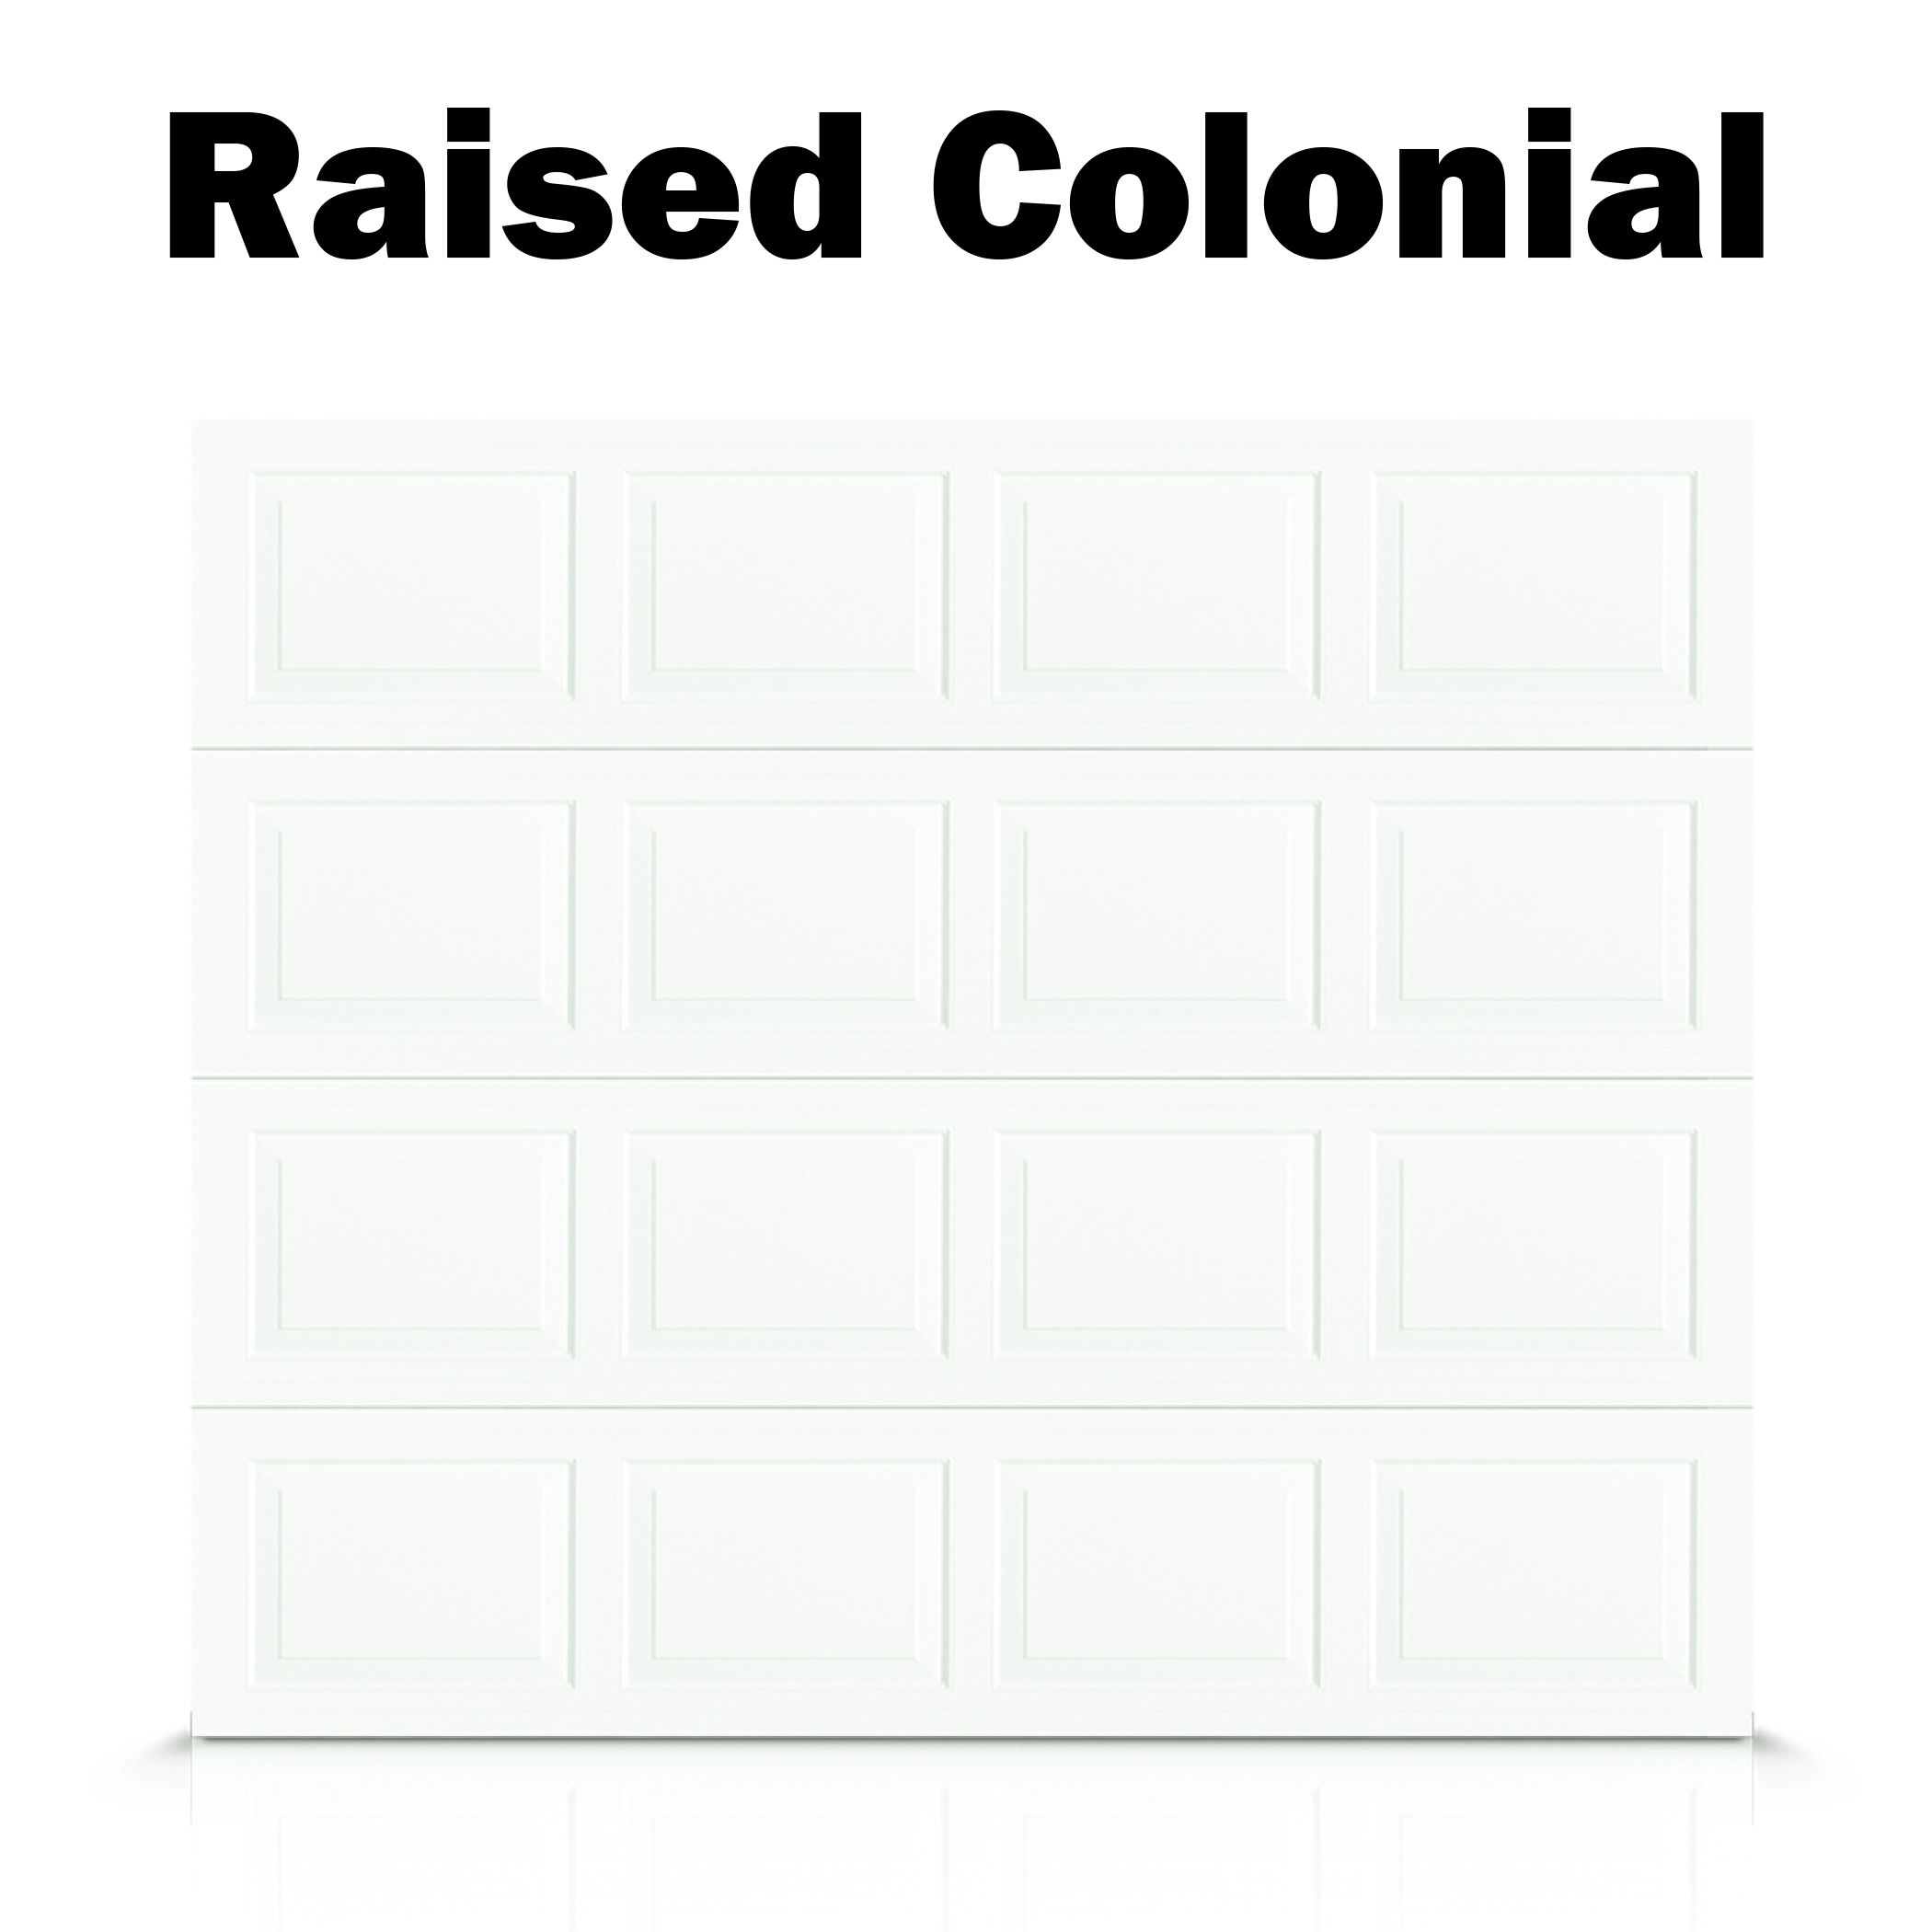 Raised Colonial - Premium.jpg